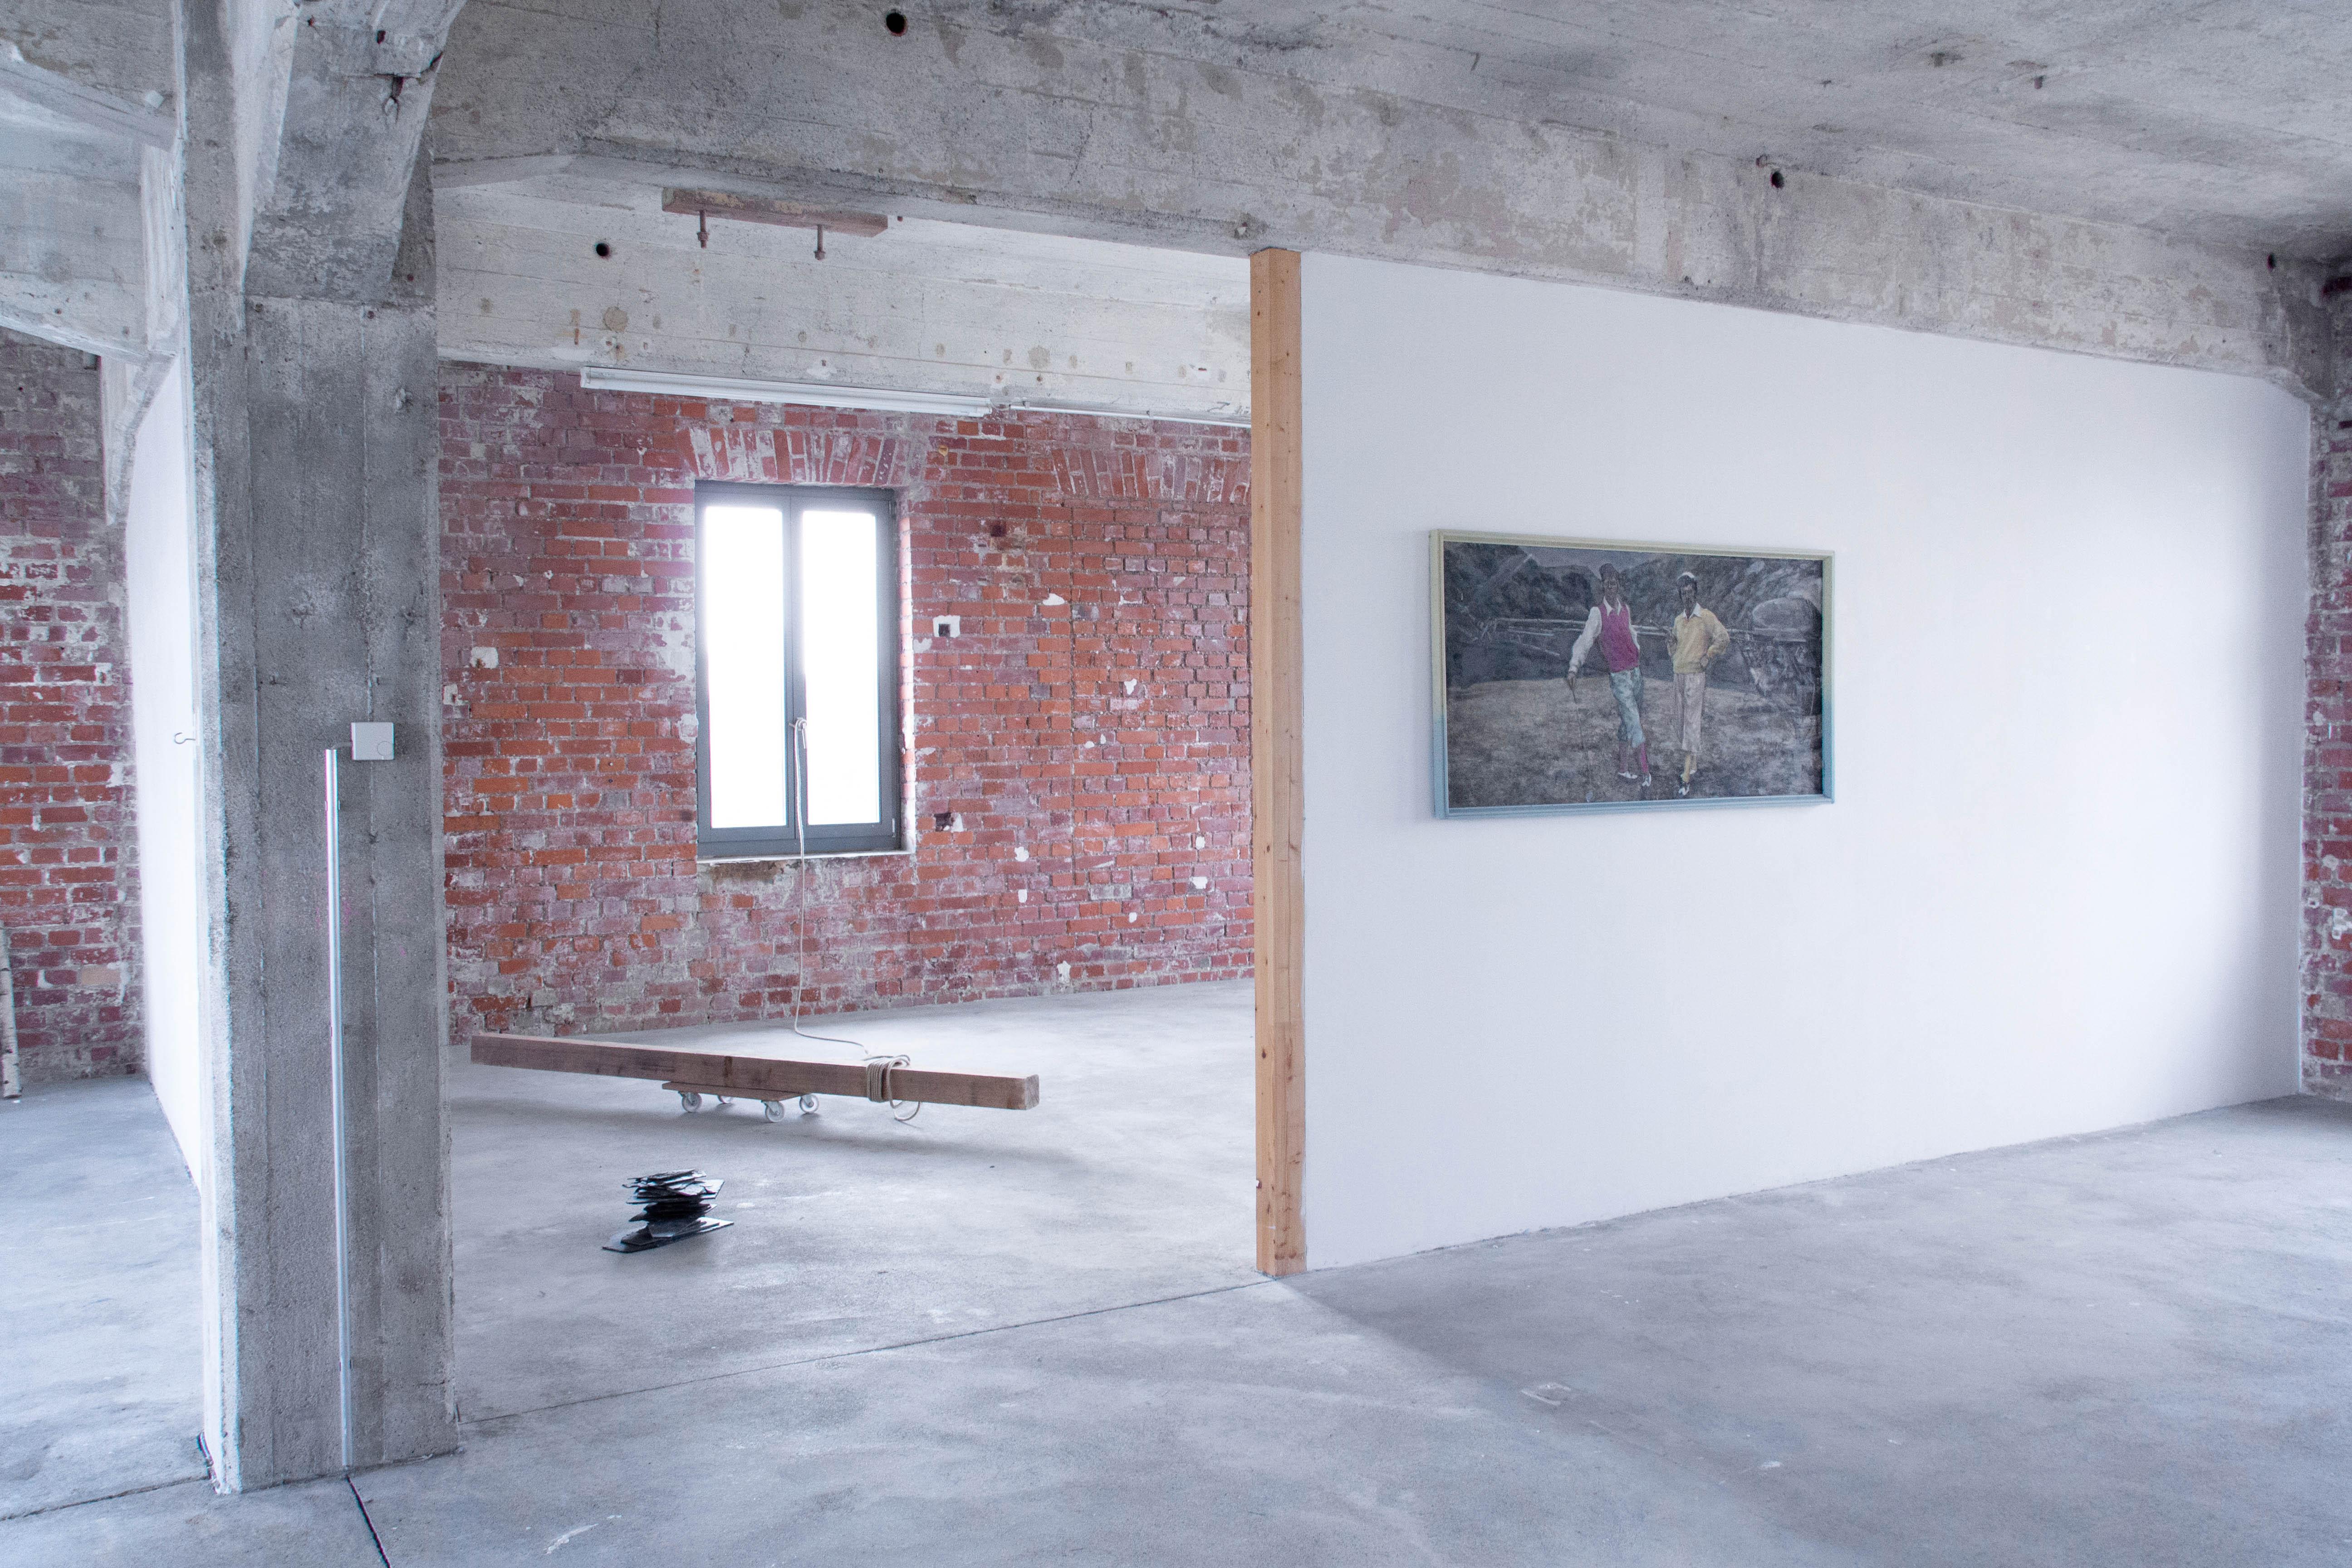 PKRD42-Hard-Fluid-Betrayal-installation-view-PILOTENKUECHE-36-Kopie